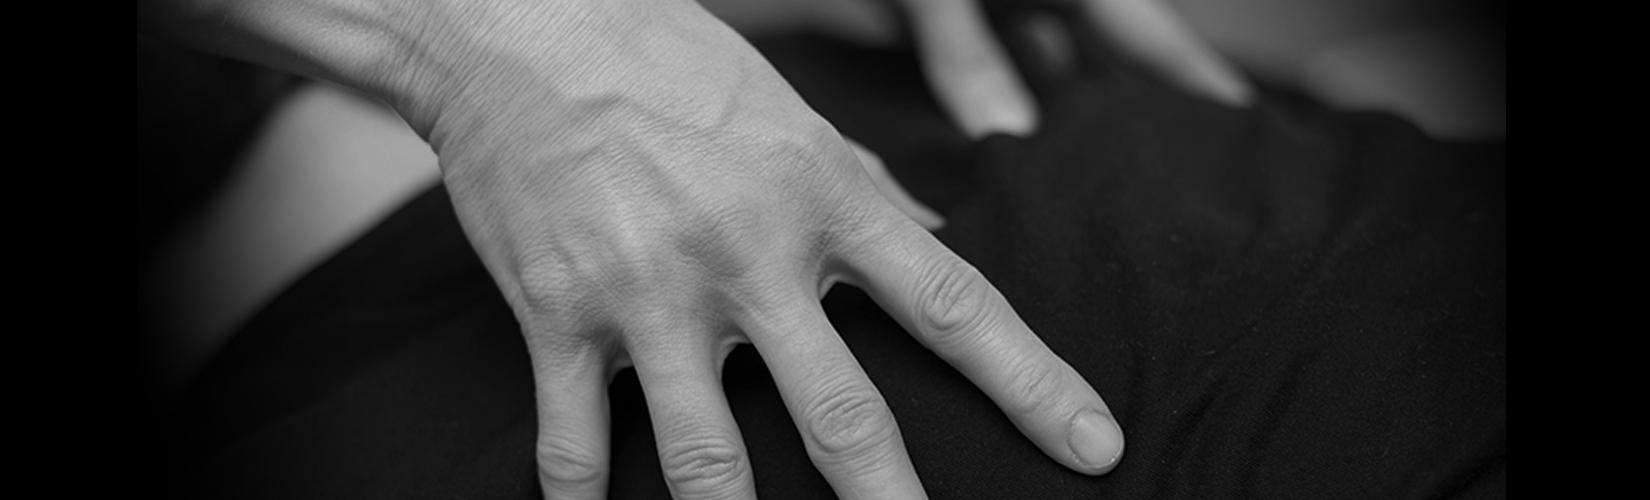 hand shiatsu acupressure